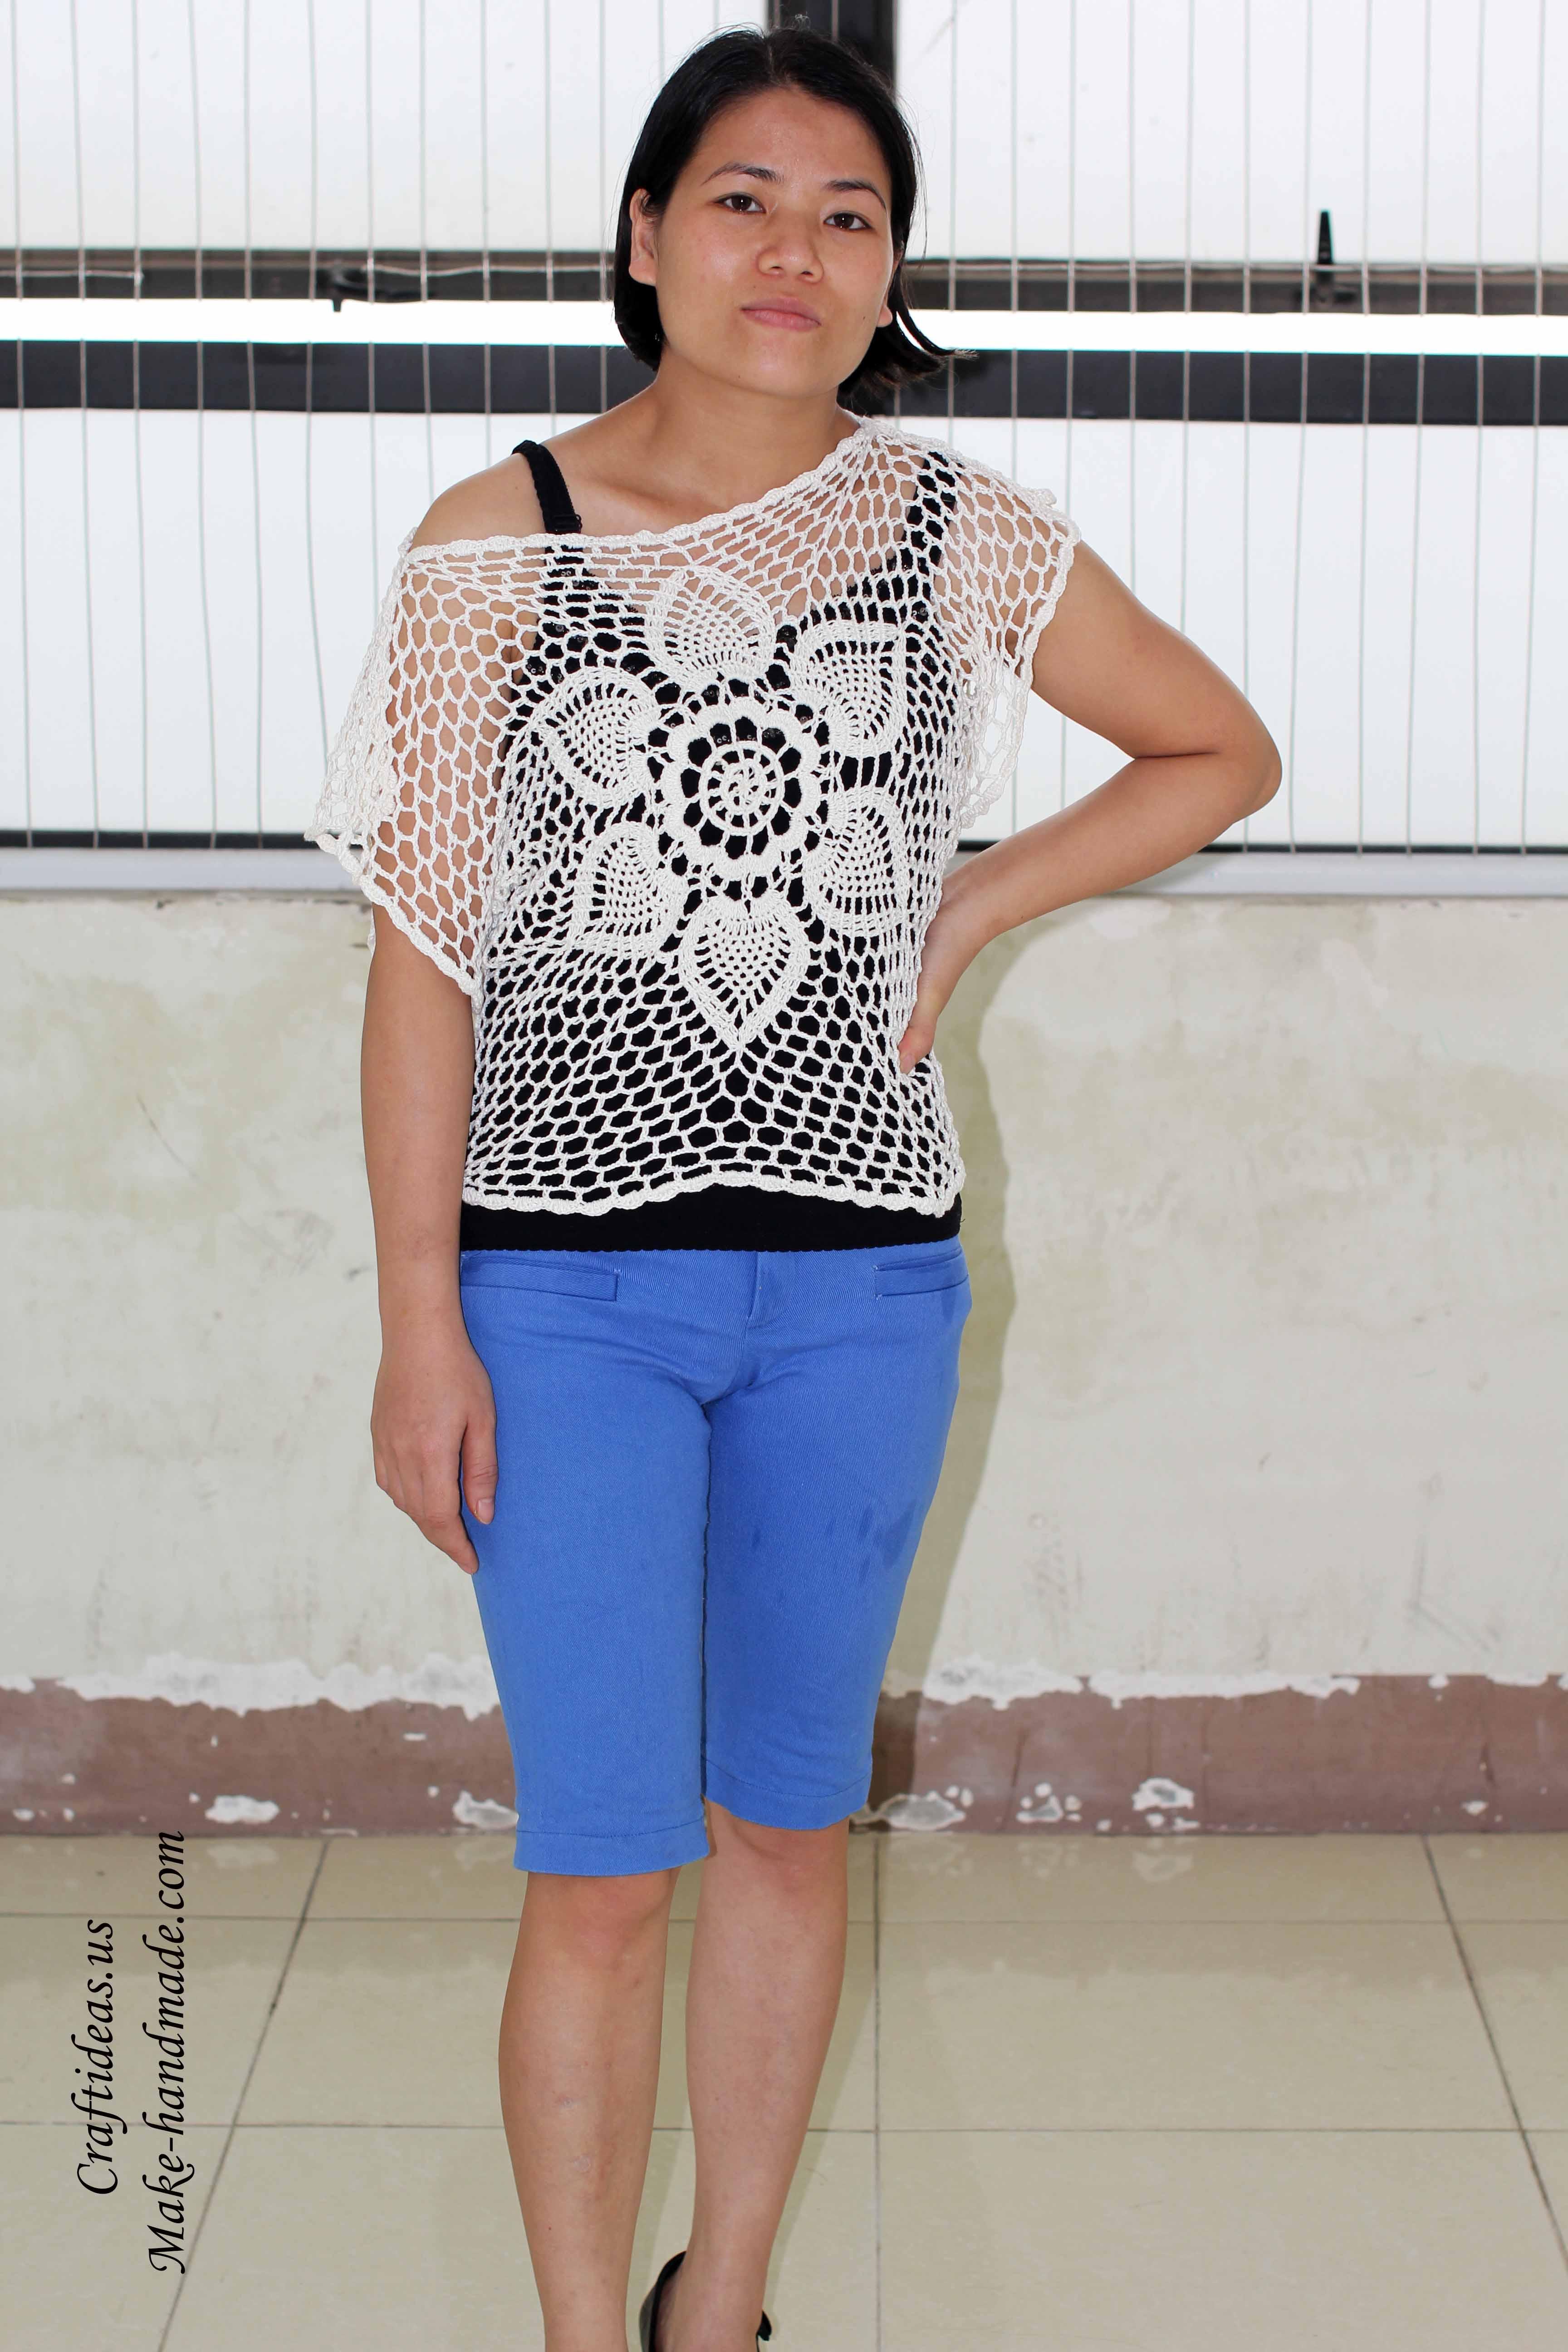 Crochet summer croptop ideas - Craft Ideas